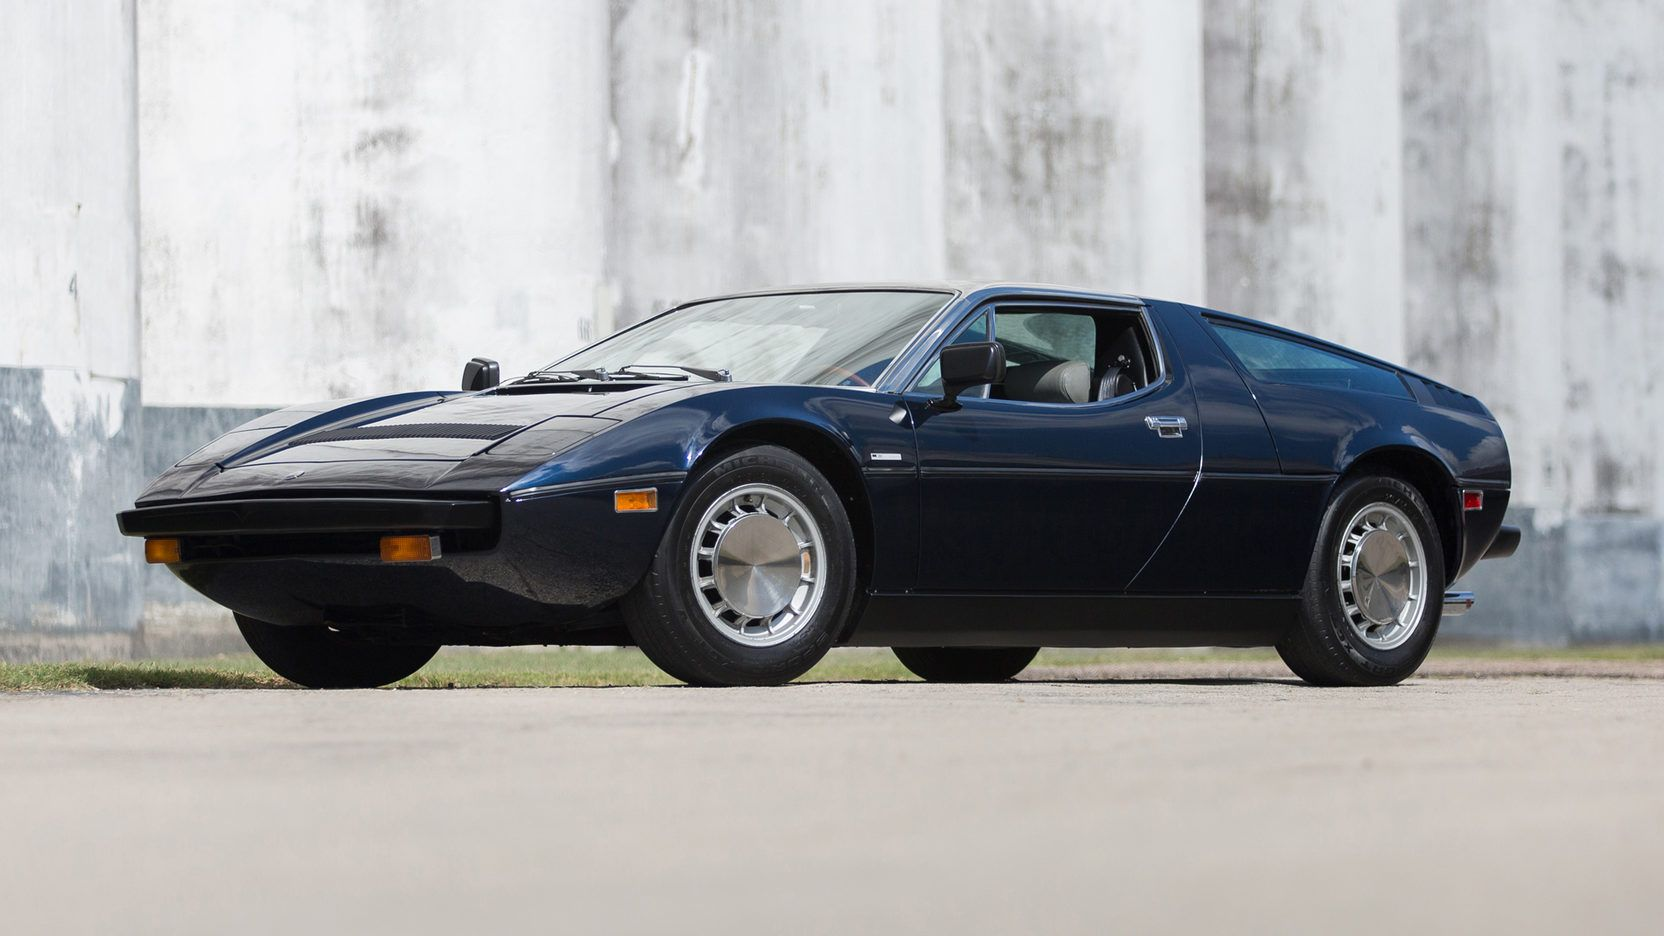 1975 Maserati Bora 4.9 presented as Lot S145 at Dallas, TX   Maserati bora, Maserati, Classic cars